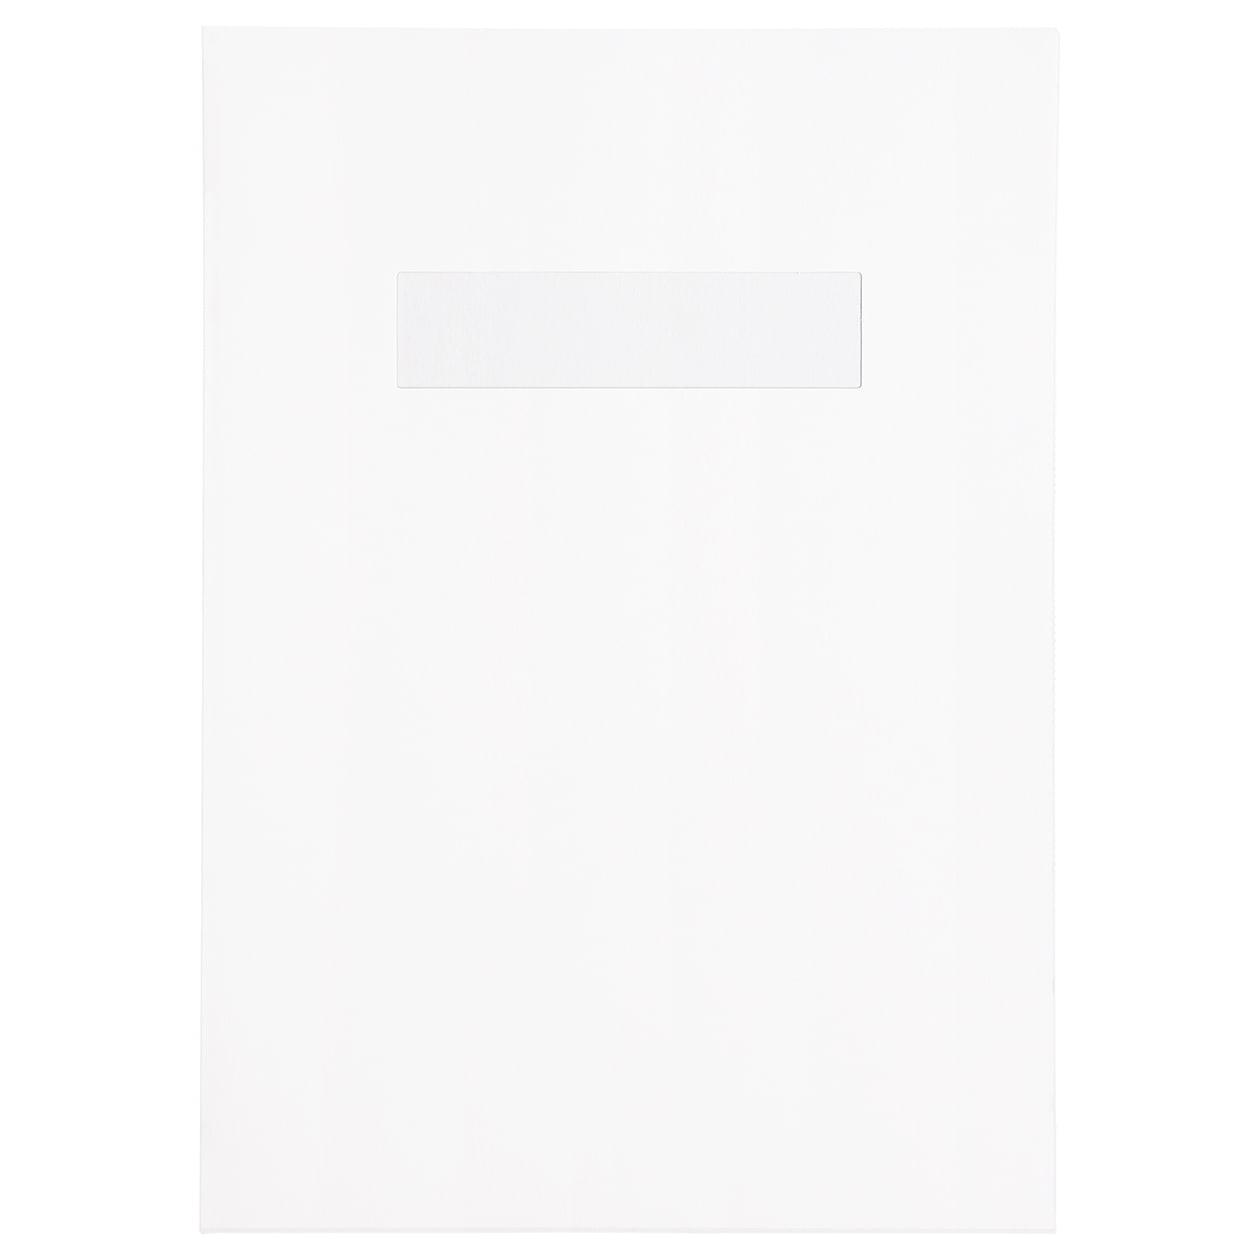 A4ファイル窓付 HAGURUMA Basic プレインホワイト 150g